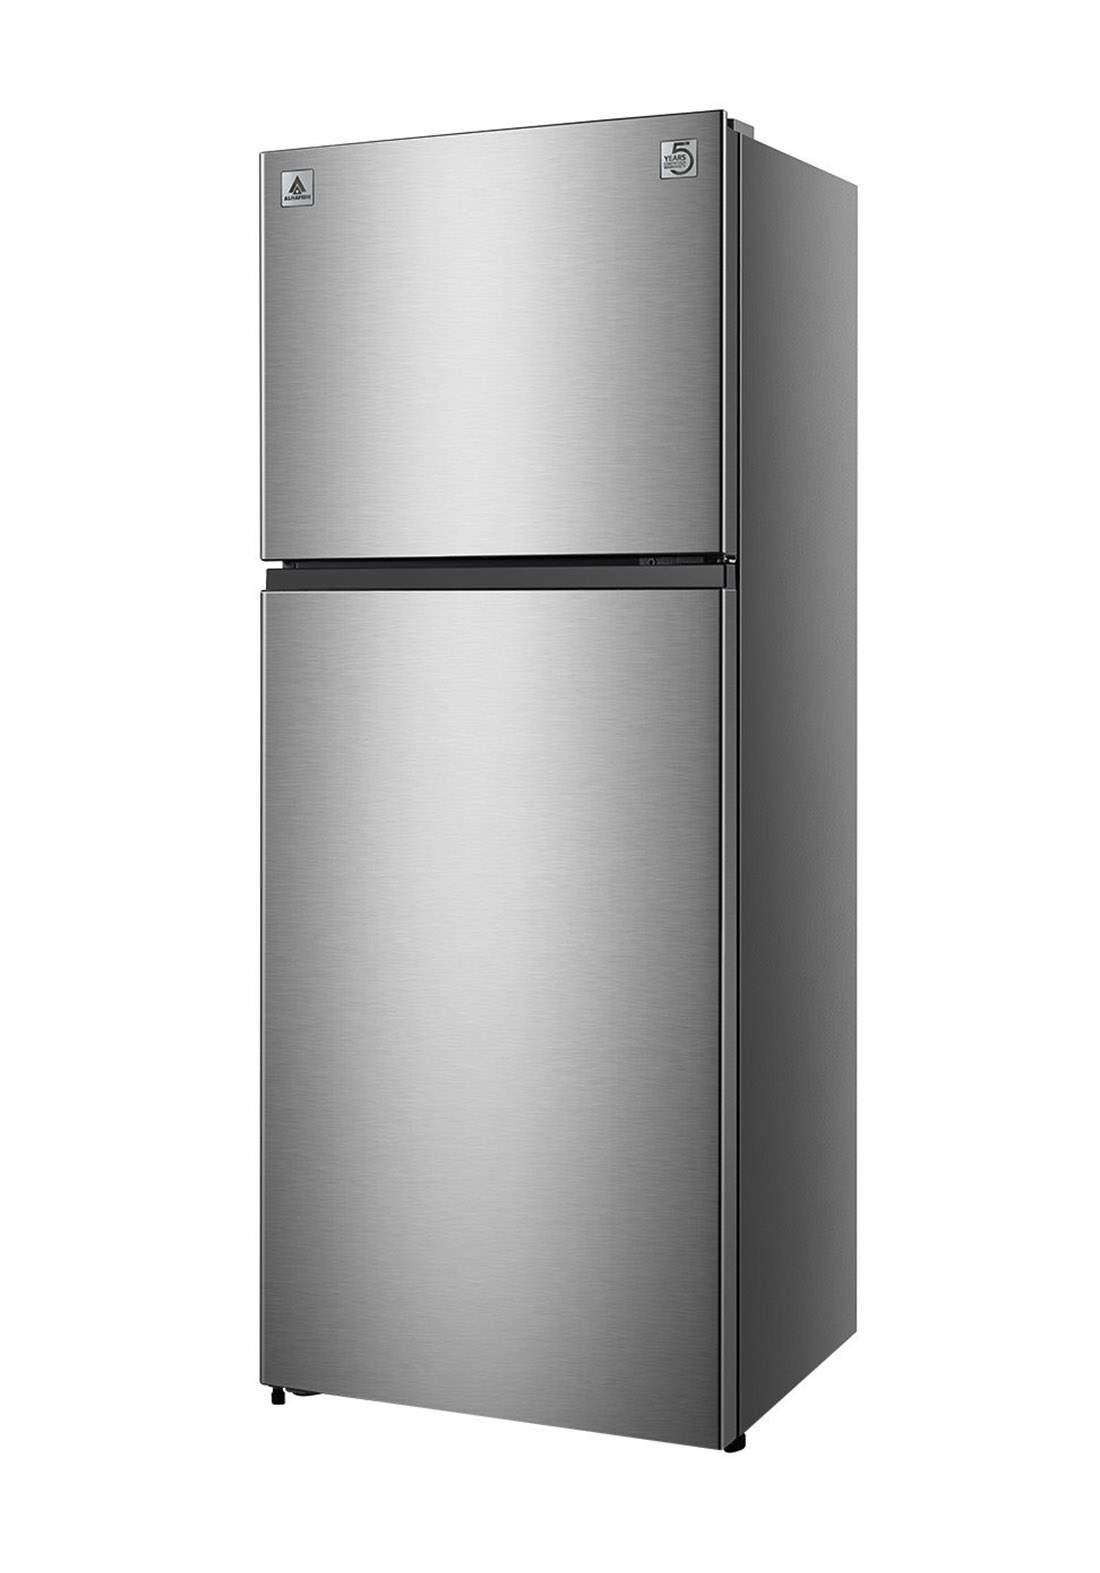 Alhafidh (RFHA-TM600NDS) 21cu.Ft. Top Mount Refrigerator ثلاجة بابين